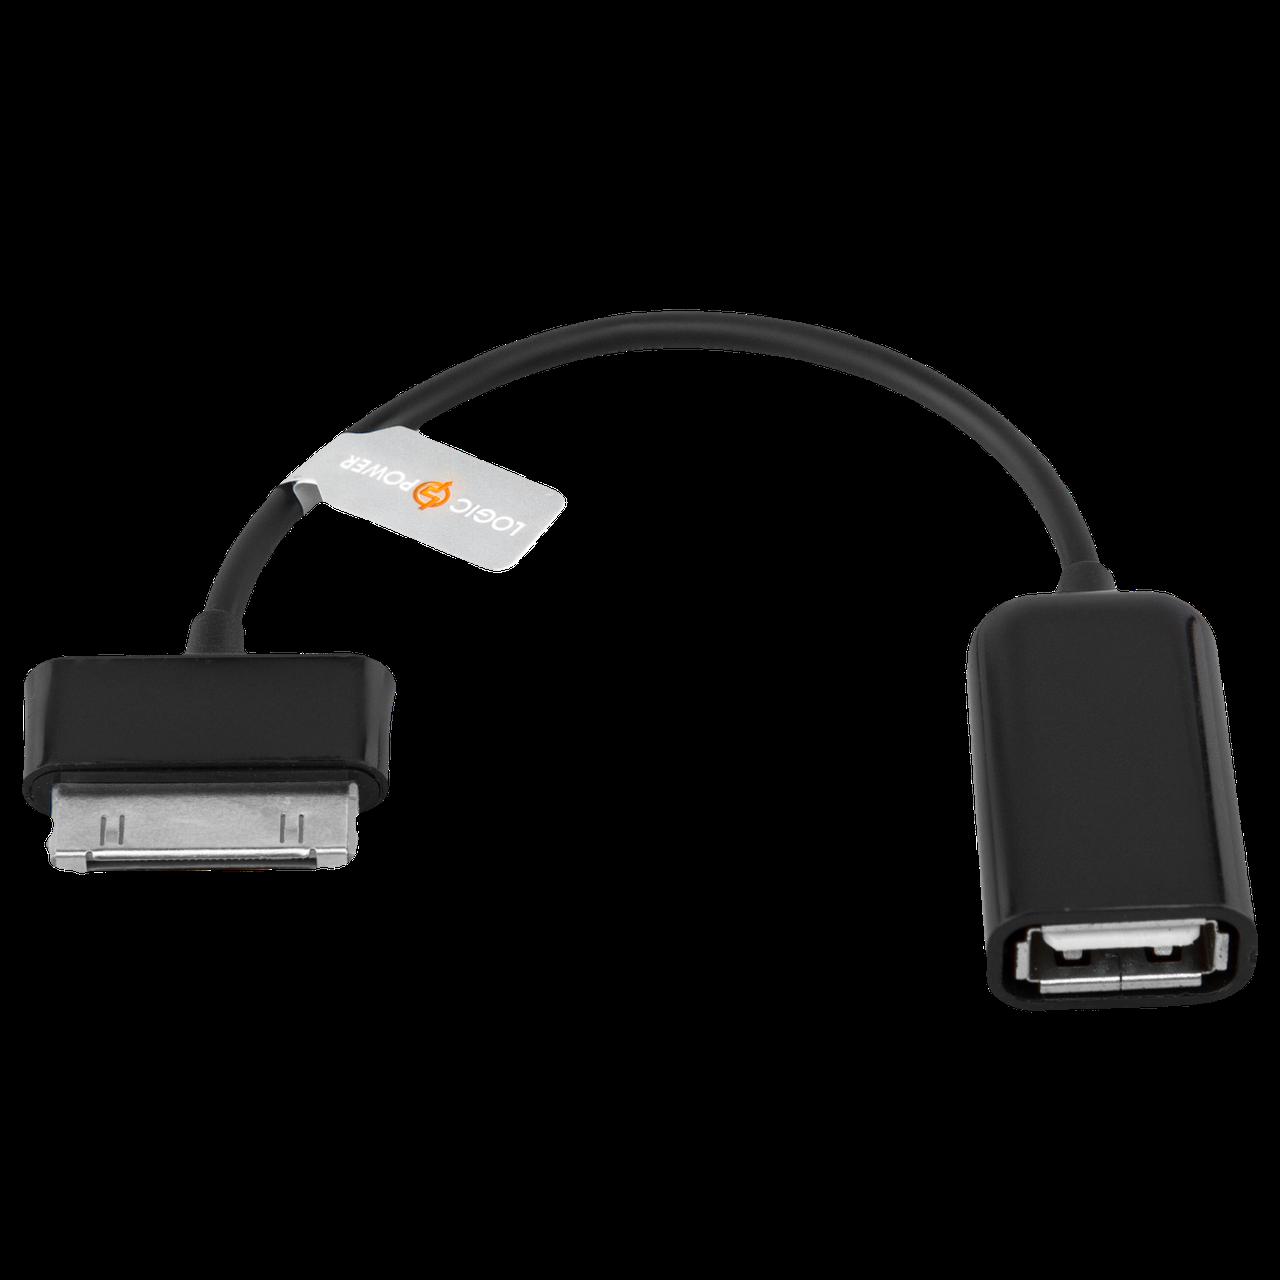 USB кабель LogicPower